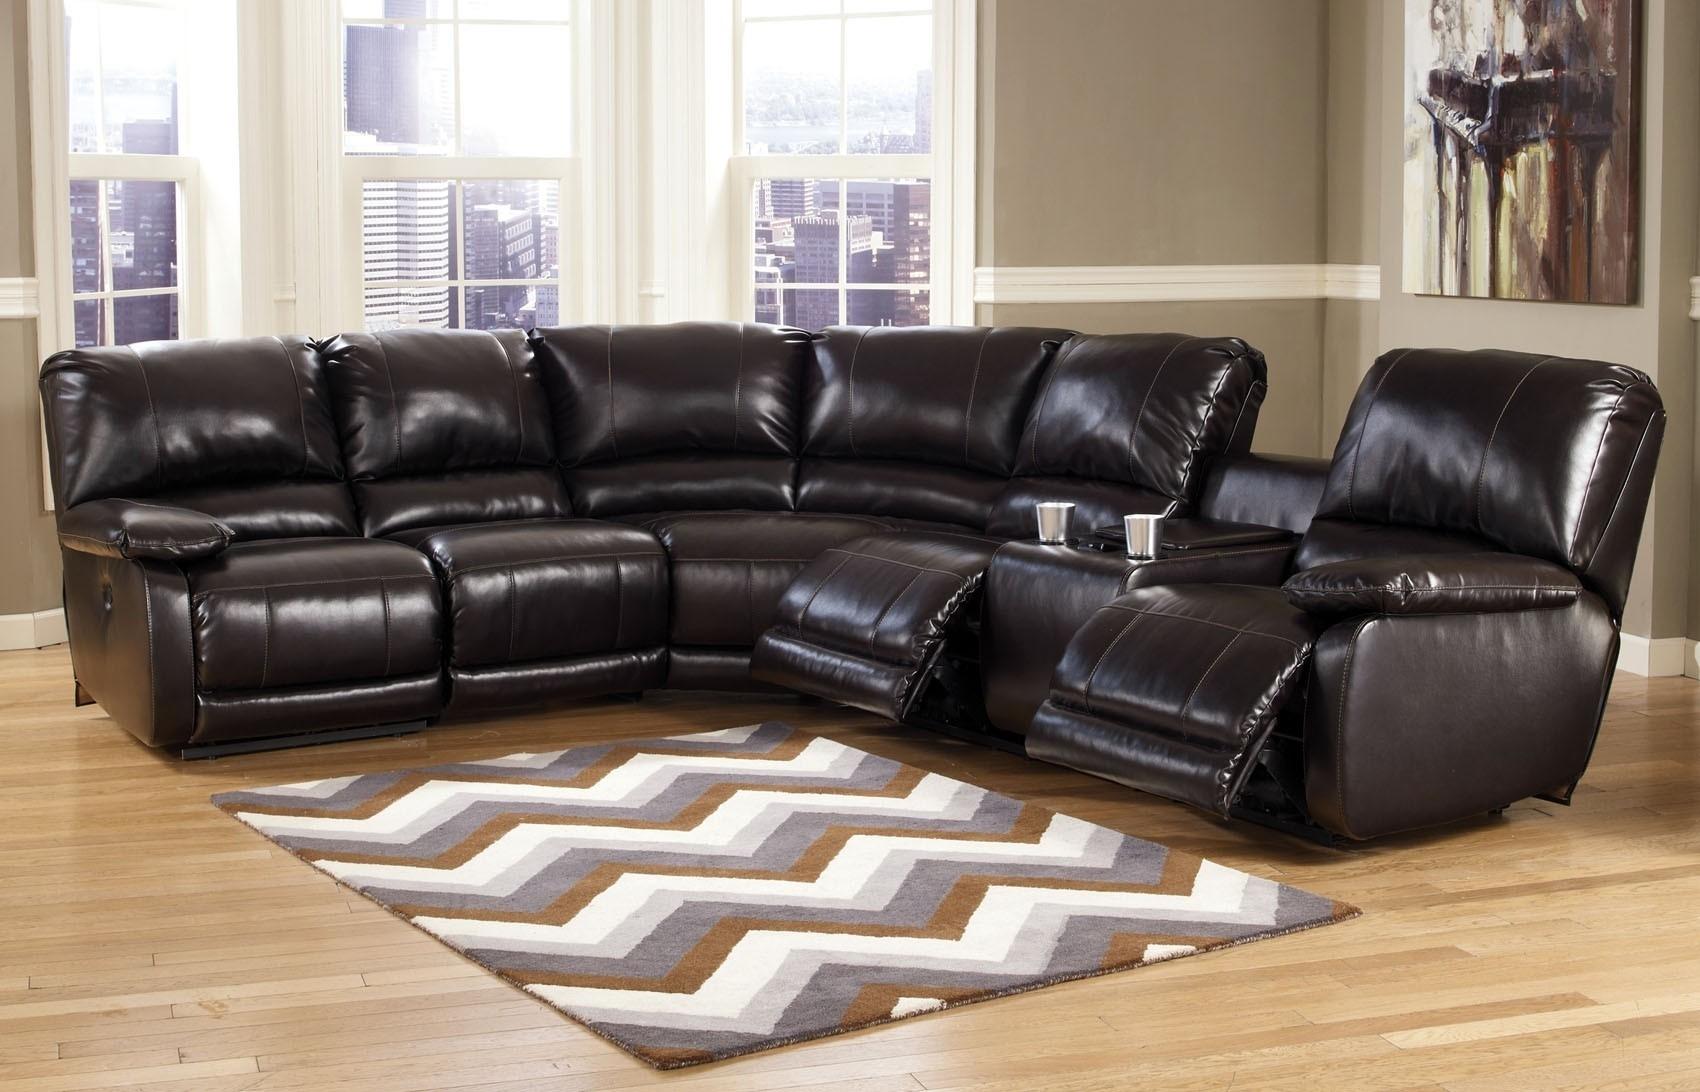 sectional sofas orange county ca large grey corner sofa sale ideas explore 7